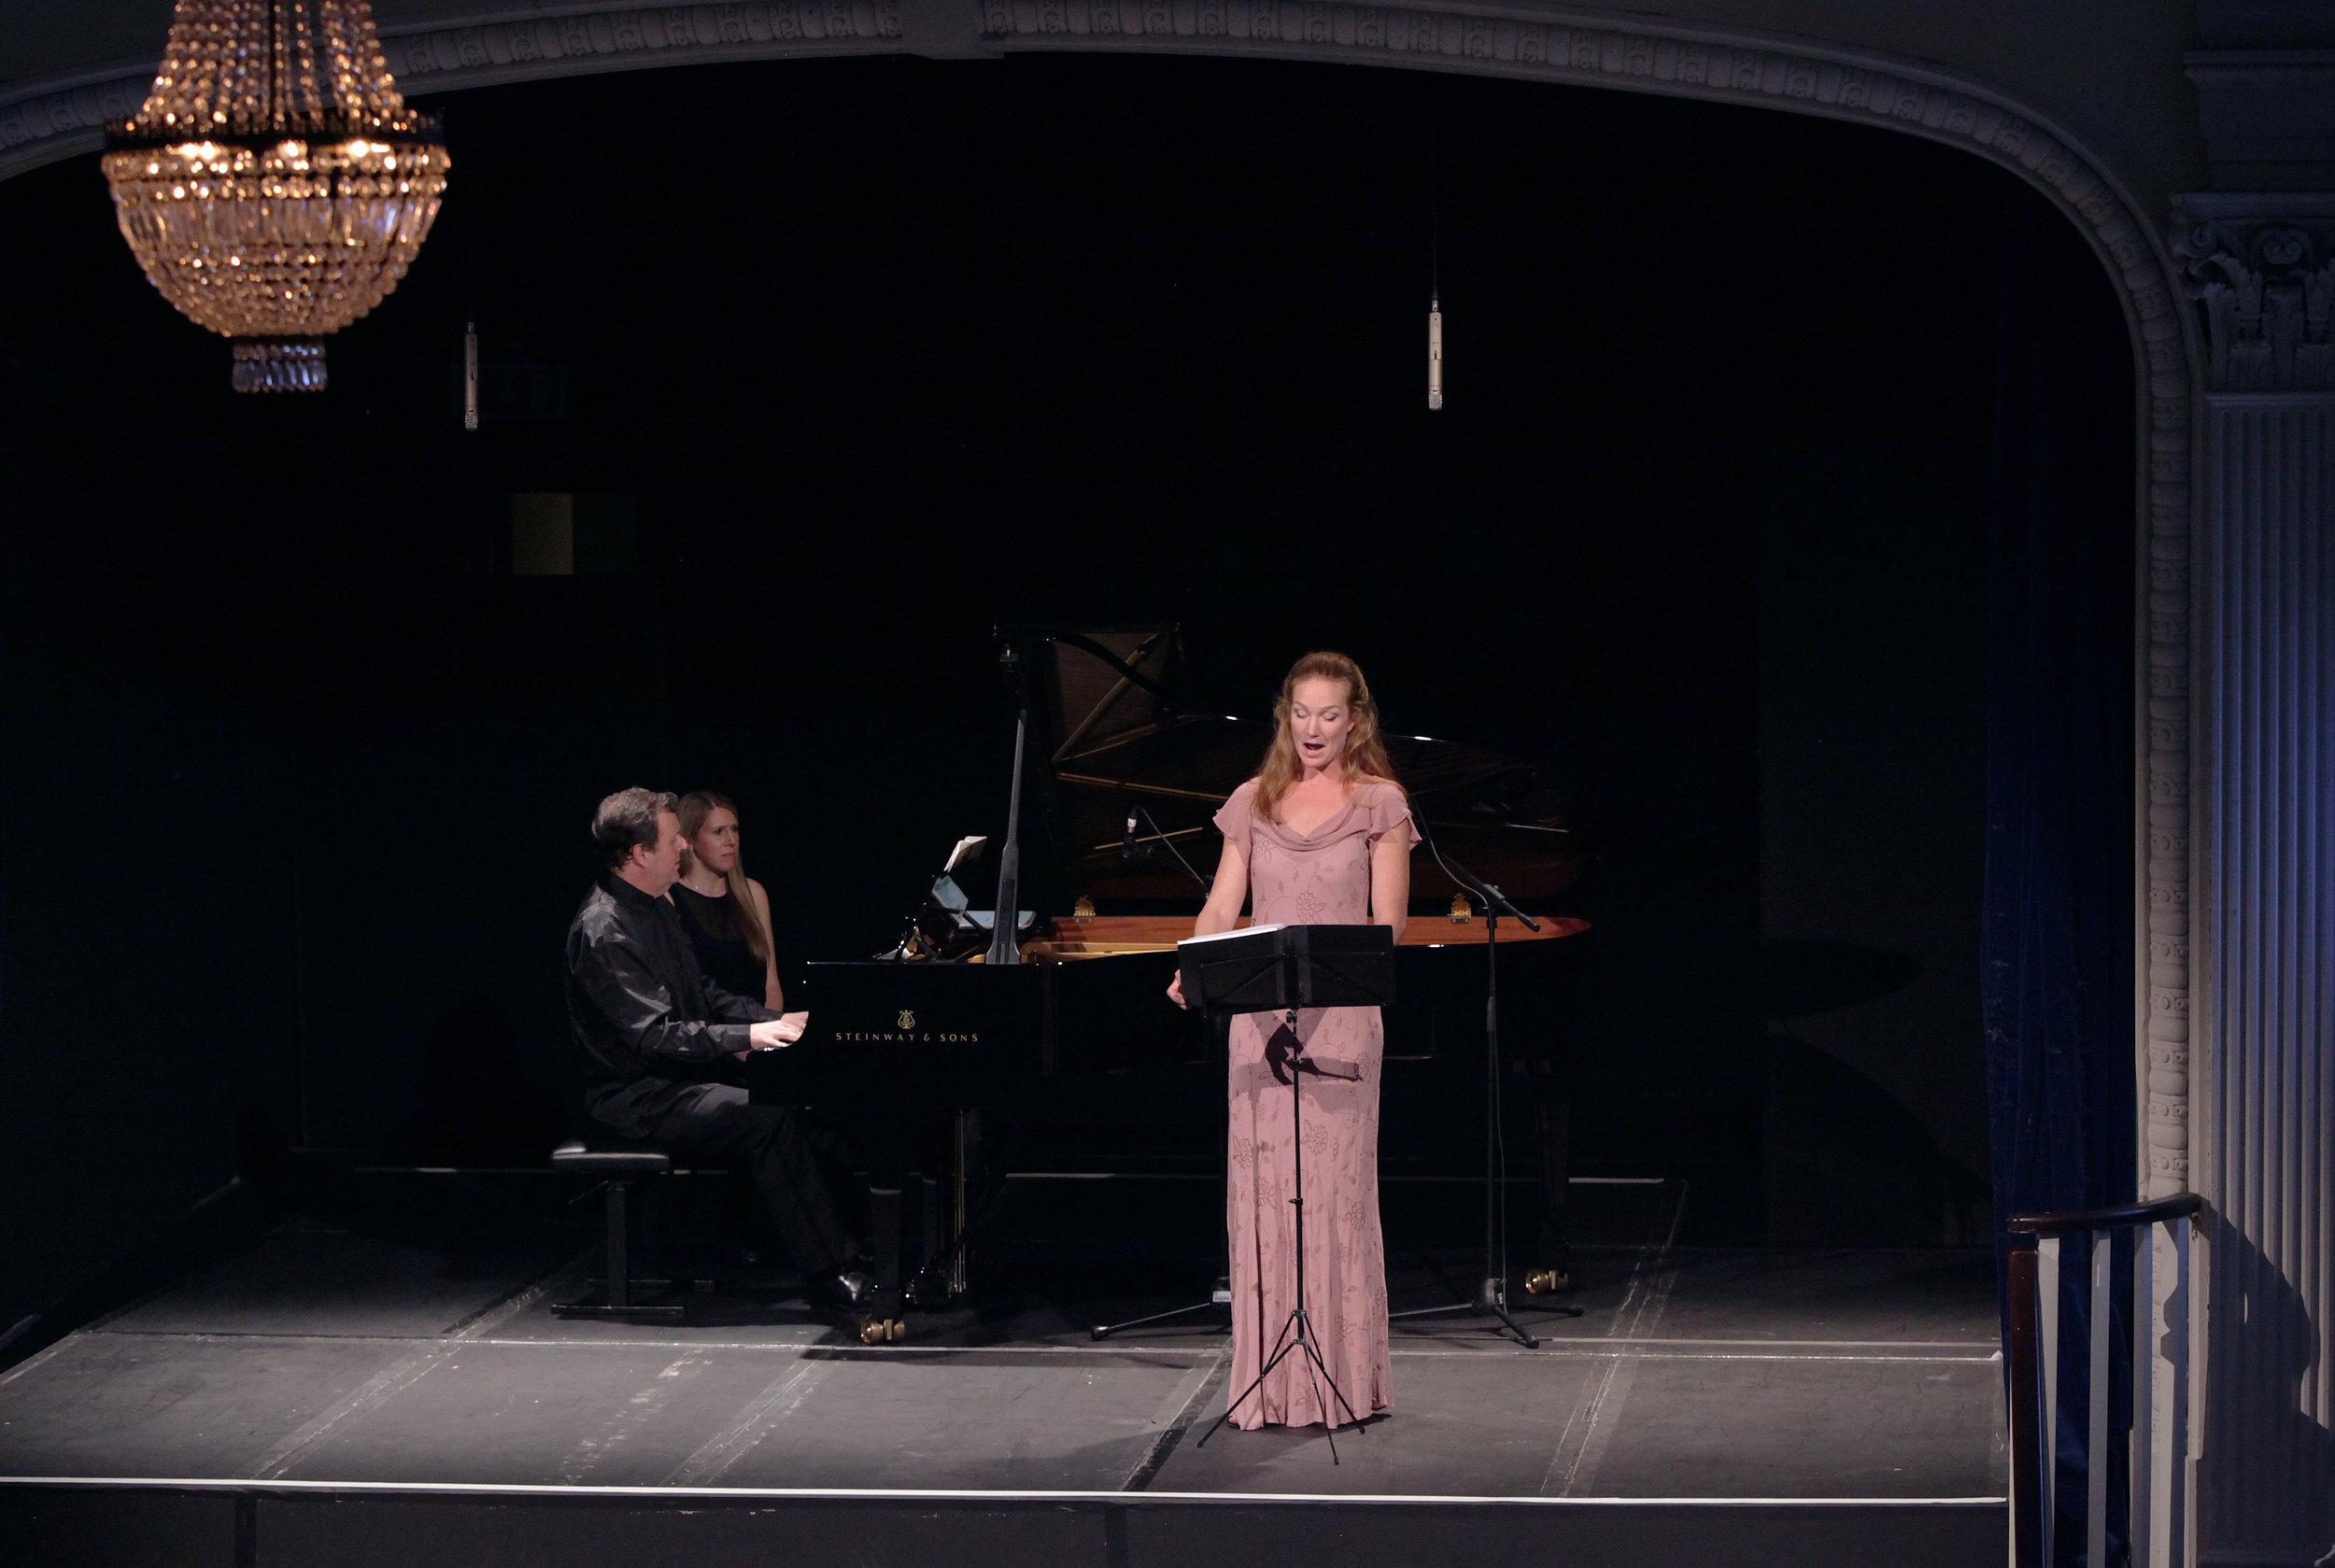 ALMA MAHLER: MUSE OR MONSTER? - october 1, 2014. 20th century theater, londonOlivia Ray, mezzo-sopranoAnia Safonova, violinOleg Kogan, celloRonan O'Hora, pianoIllustrated talk by Patrick BadeAlma Mahler - 'Laue Sommernacht' from 5 Lieder; 'Der Erkennende' and 'Lobgesang' from 5 GesängeZemlinsky - 'Irmelin Rose' from Irmelin Rose und andere Gesänge, Op. 7Gustav Mahler - 'Wenn mein Schatz Hochzeit macht' and 'Ging heut' morgen über's Feld' from Lieder eines fahrenden GesellenZemlinsky - Three Pieces for cello and piano (1891)Korngold - Piano Trio in D Major, Op. 1